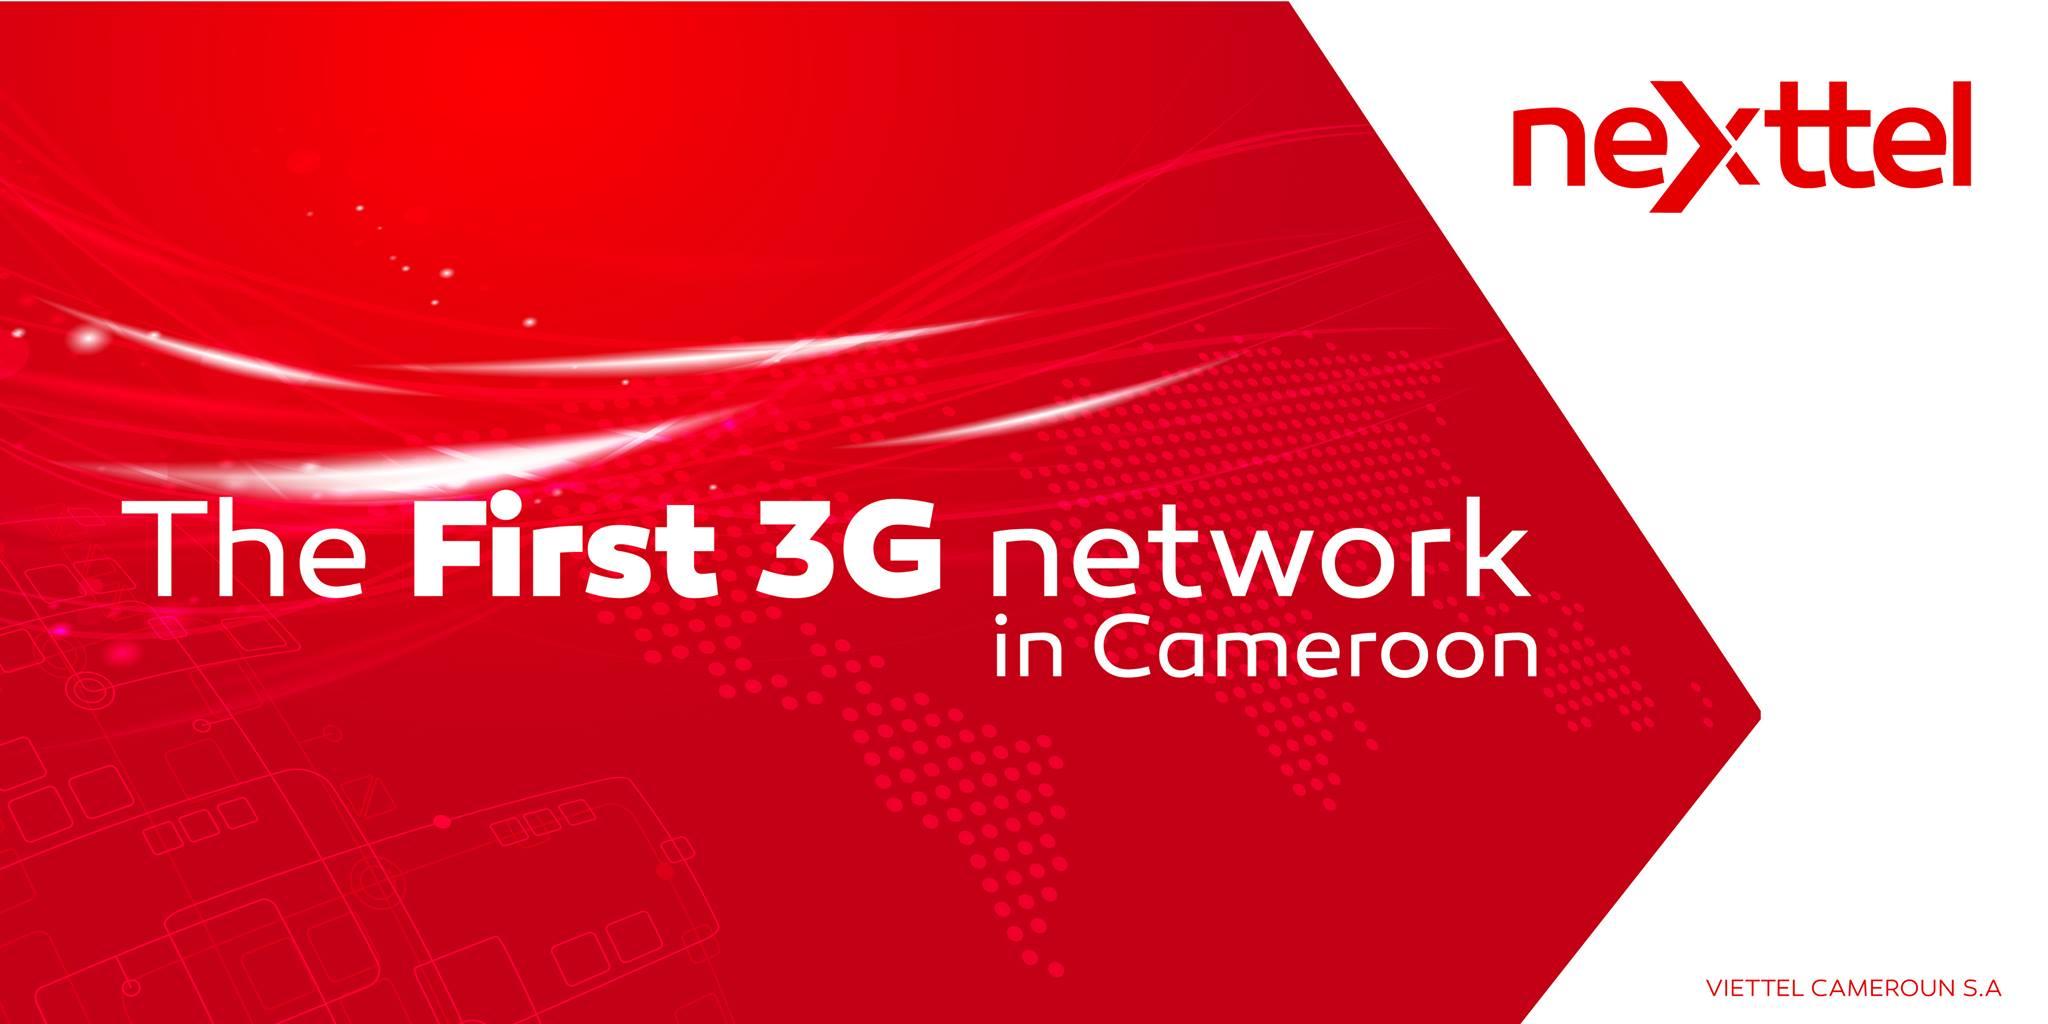 Nexttel Cameroun in crisis: Whatever Baba Danpullo wants, Baba Danpullo gets